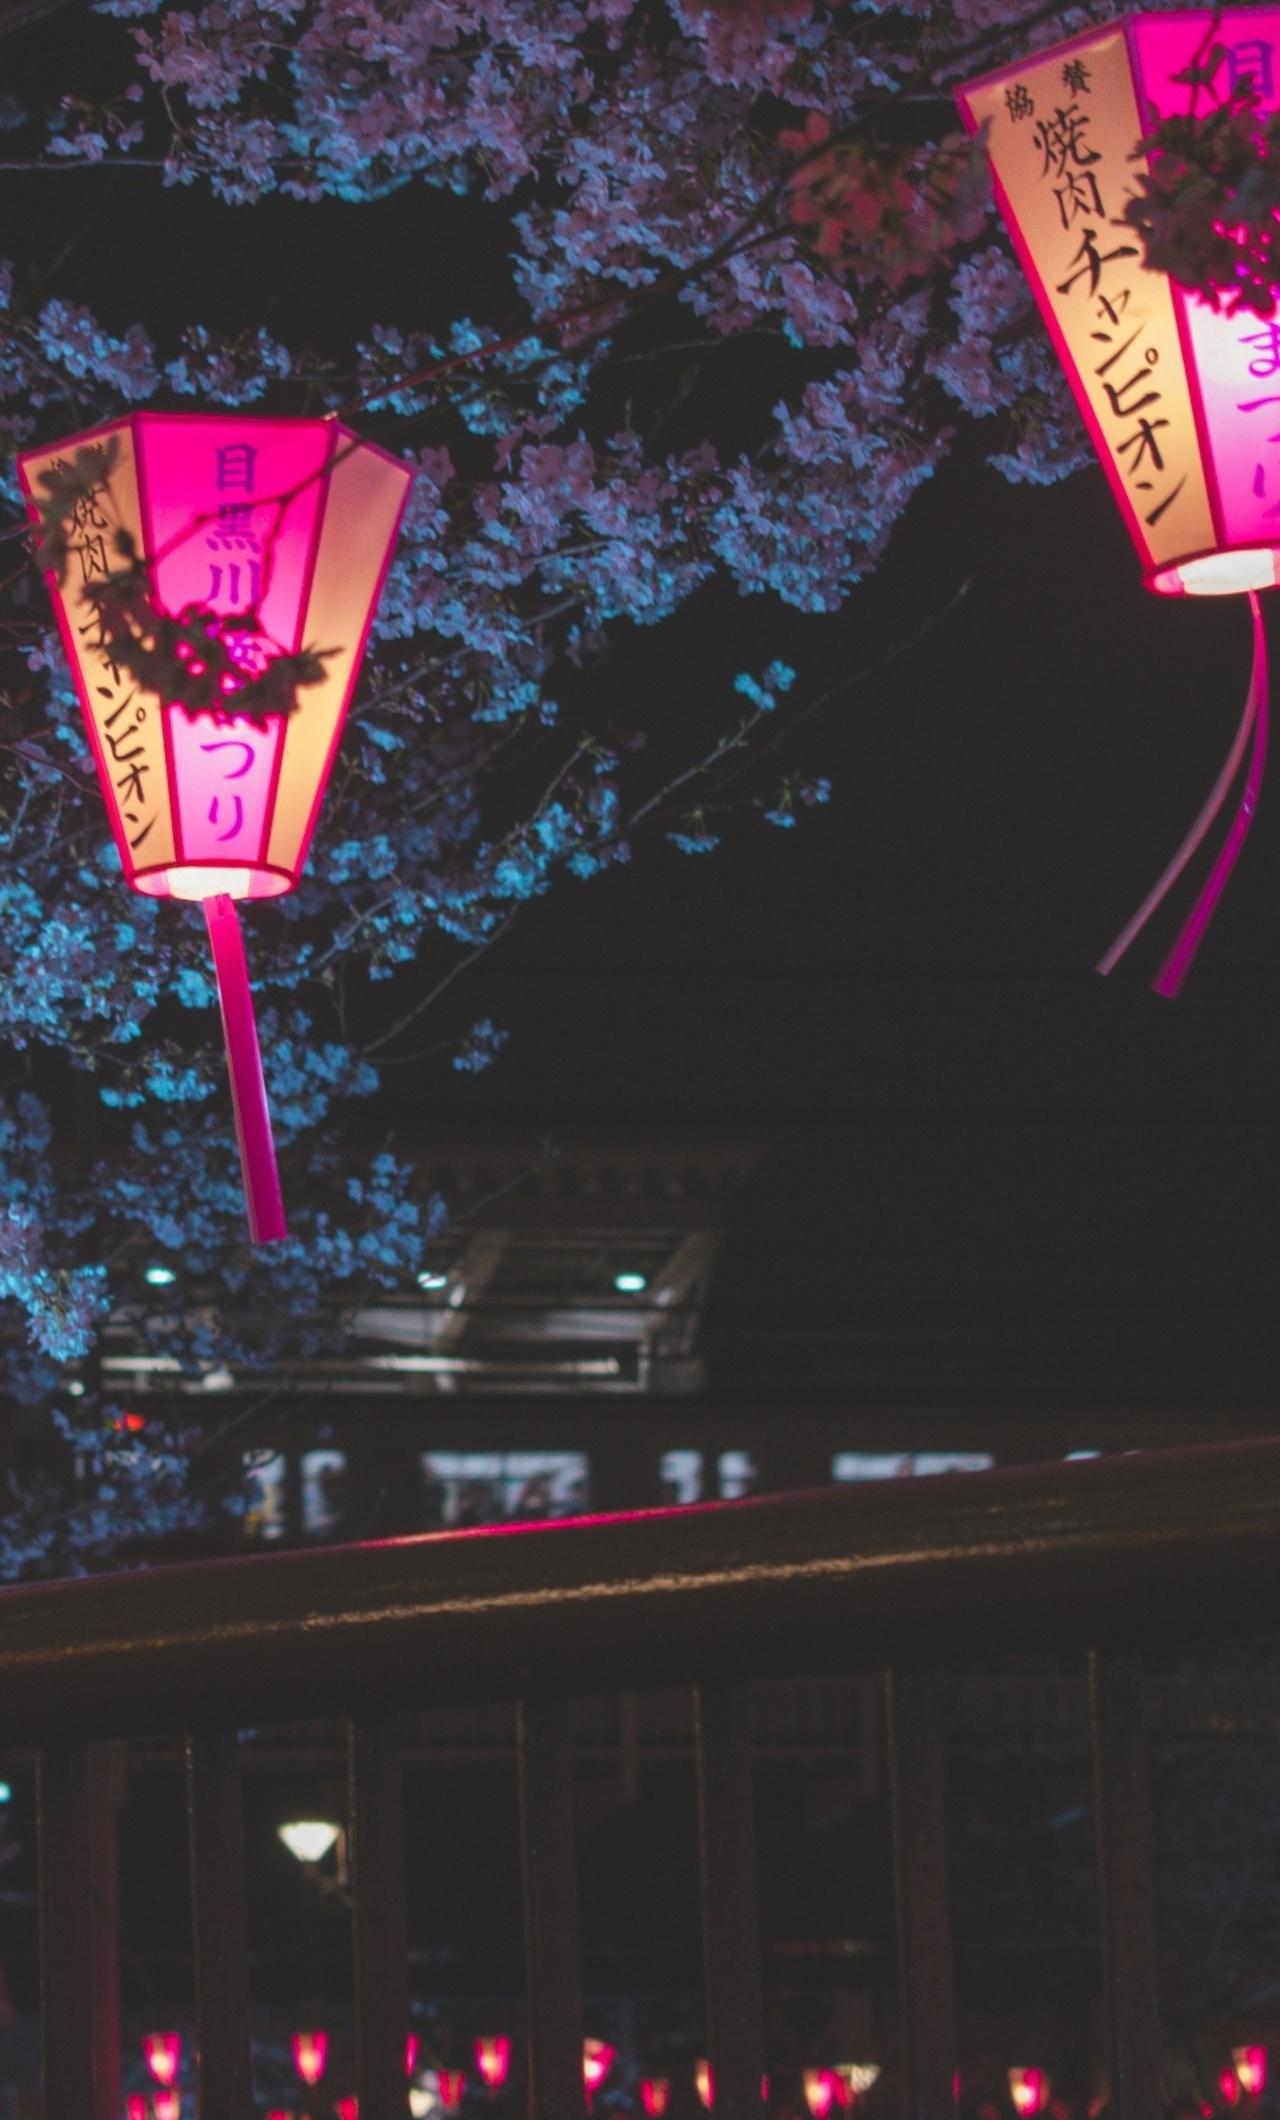 1280x2120 Japan Night Cherry Blossom Trees Lantern Glowing